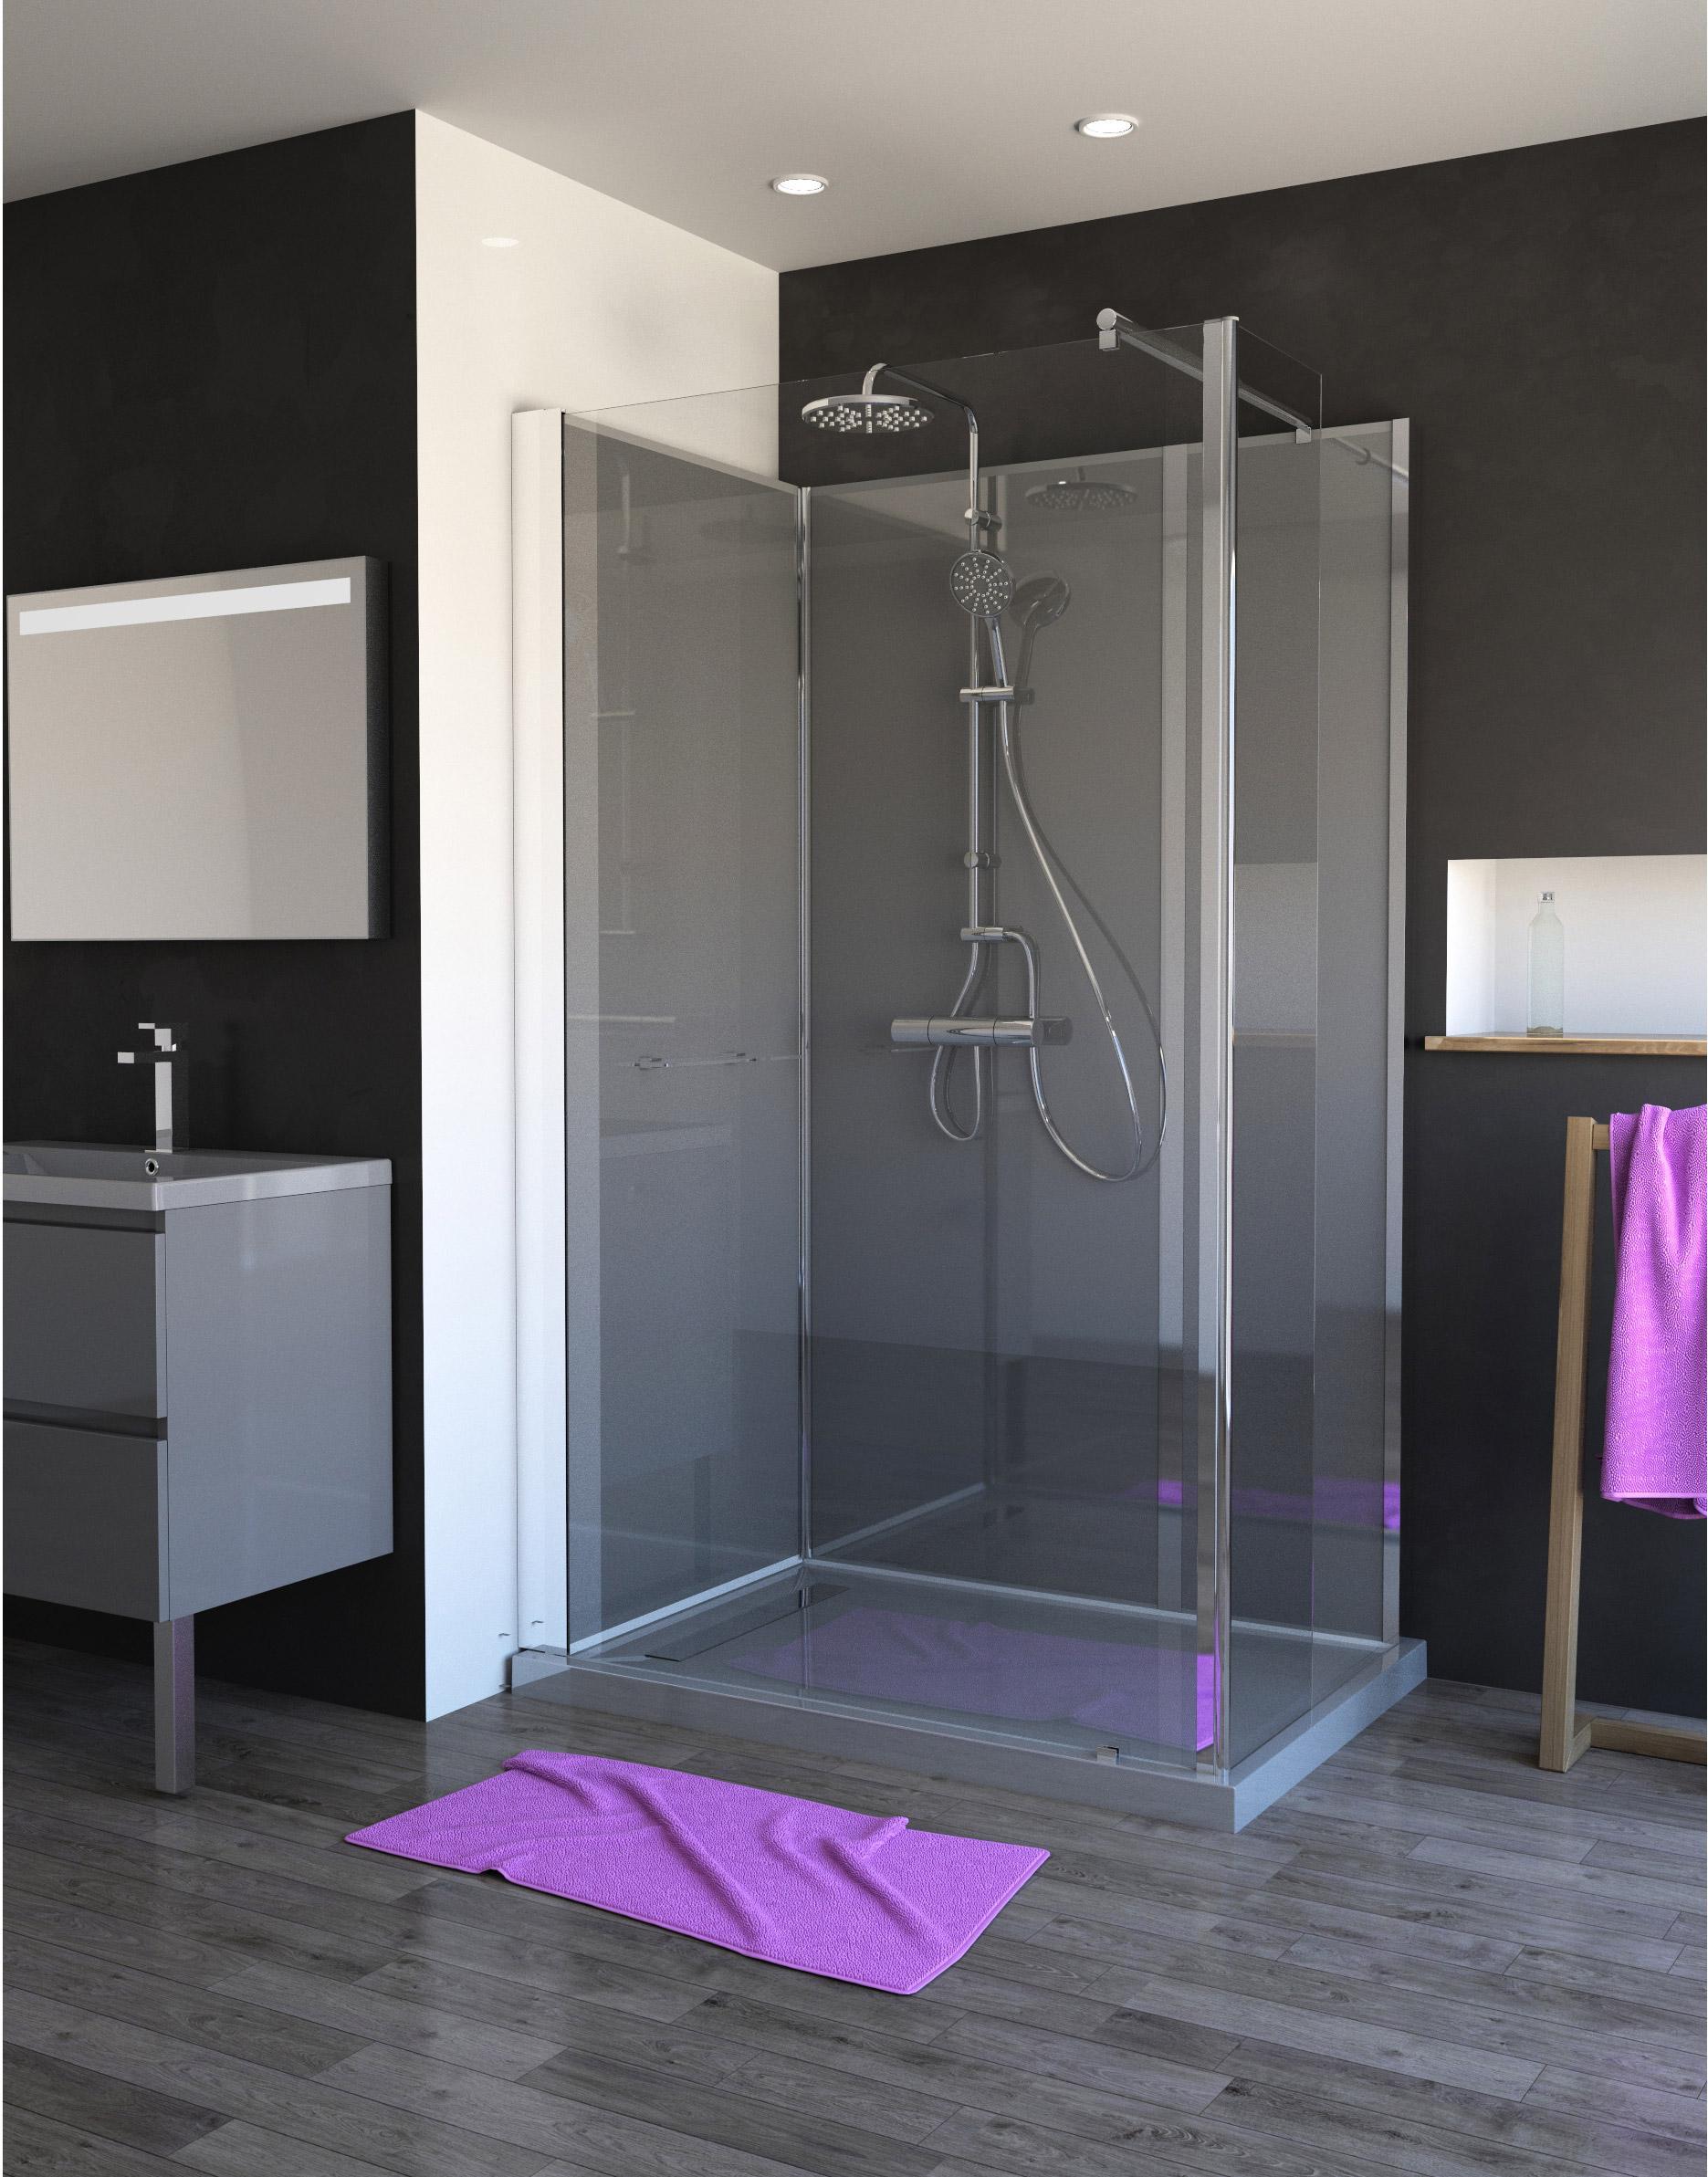 Devis Plomberie à Faches-Thumesnil ▷ Prix Installation & Rénovation Sanitaire